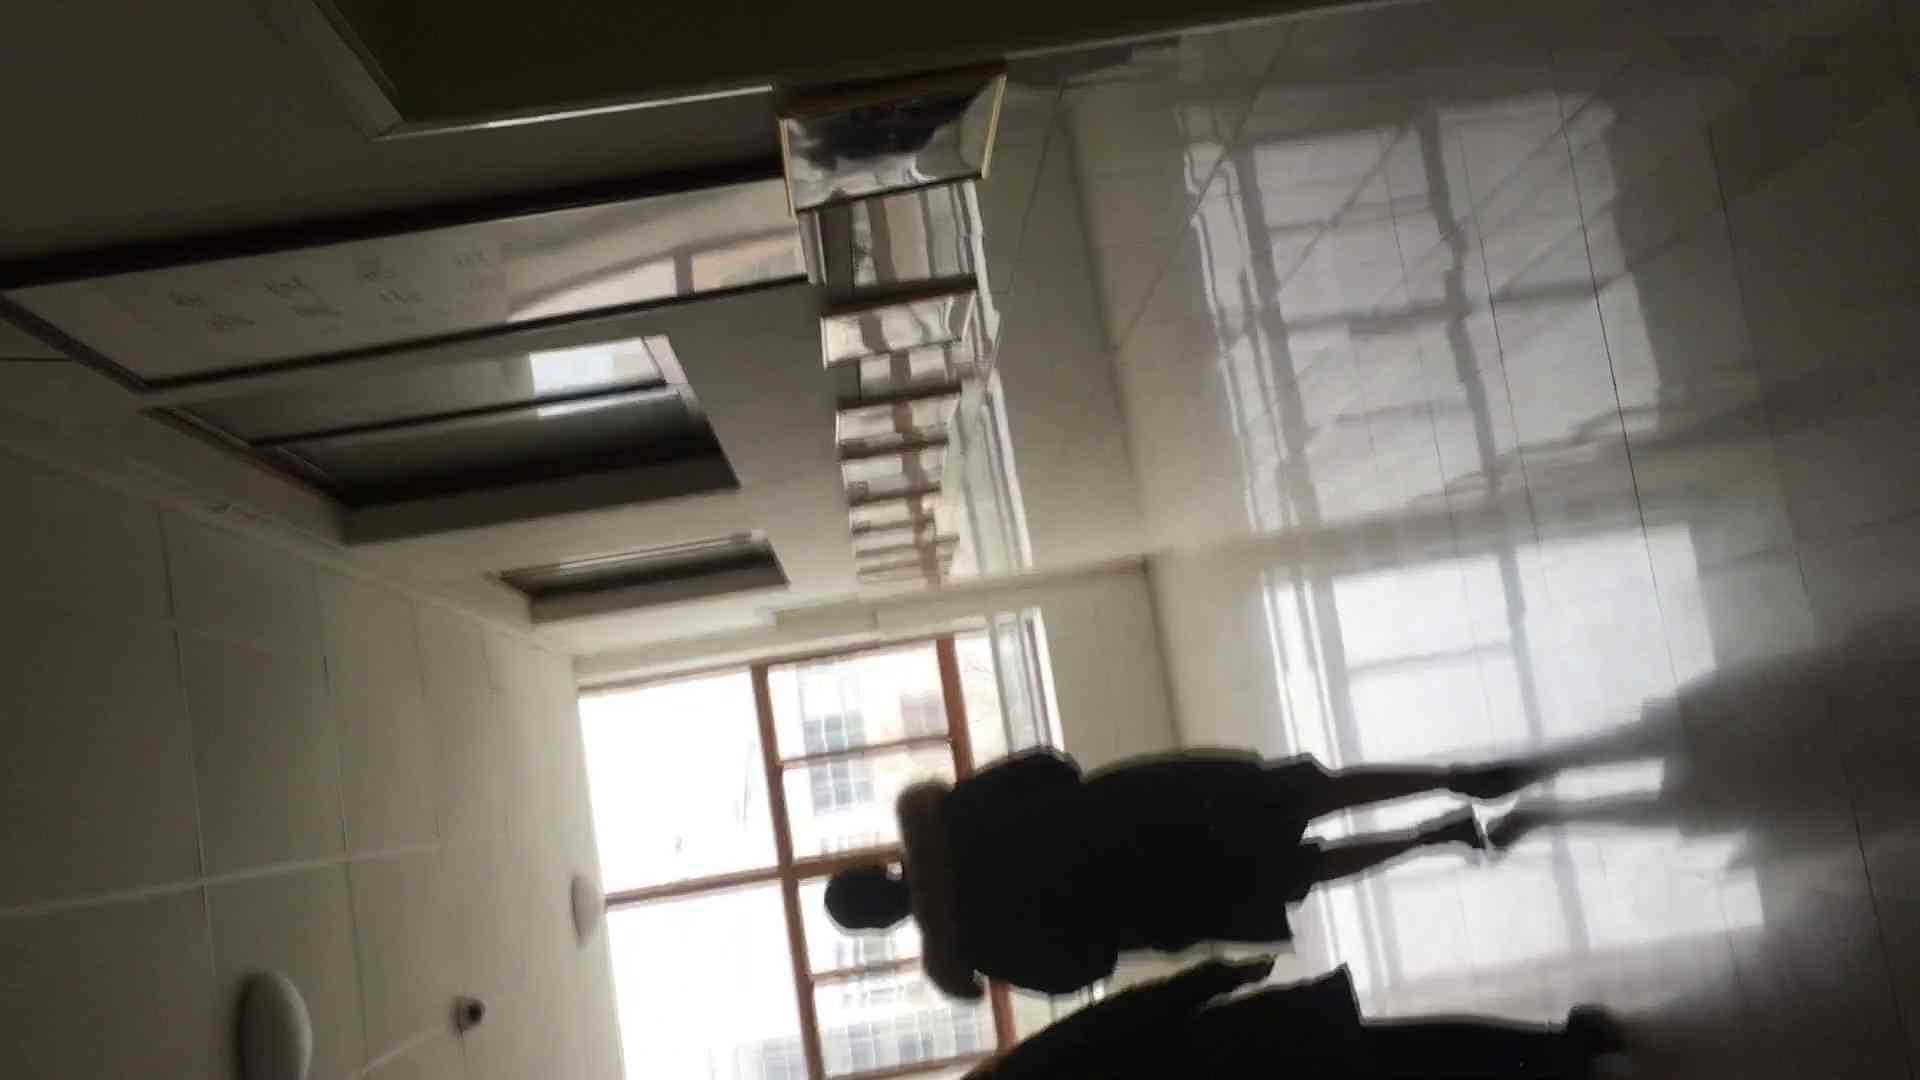 芸術大学ガチ潜入盗撮 JD盗撮 美女の洗面所の秘密 Vol.89 洗面所着替え | 潜入エロ調査  77連発 58